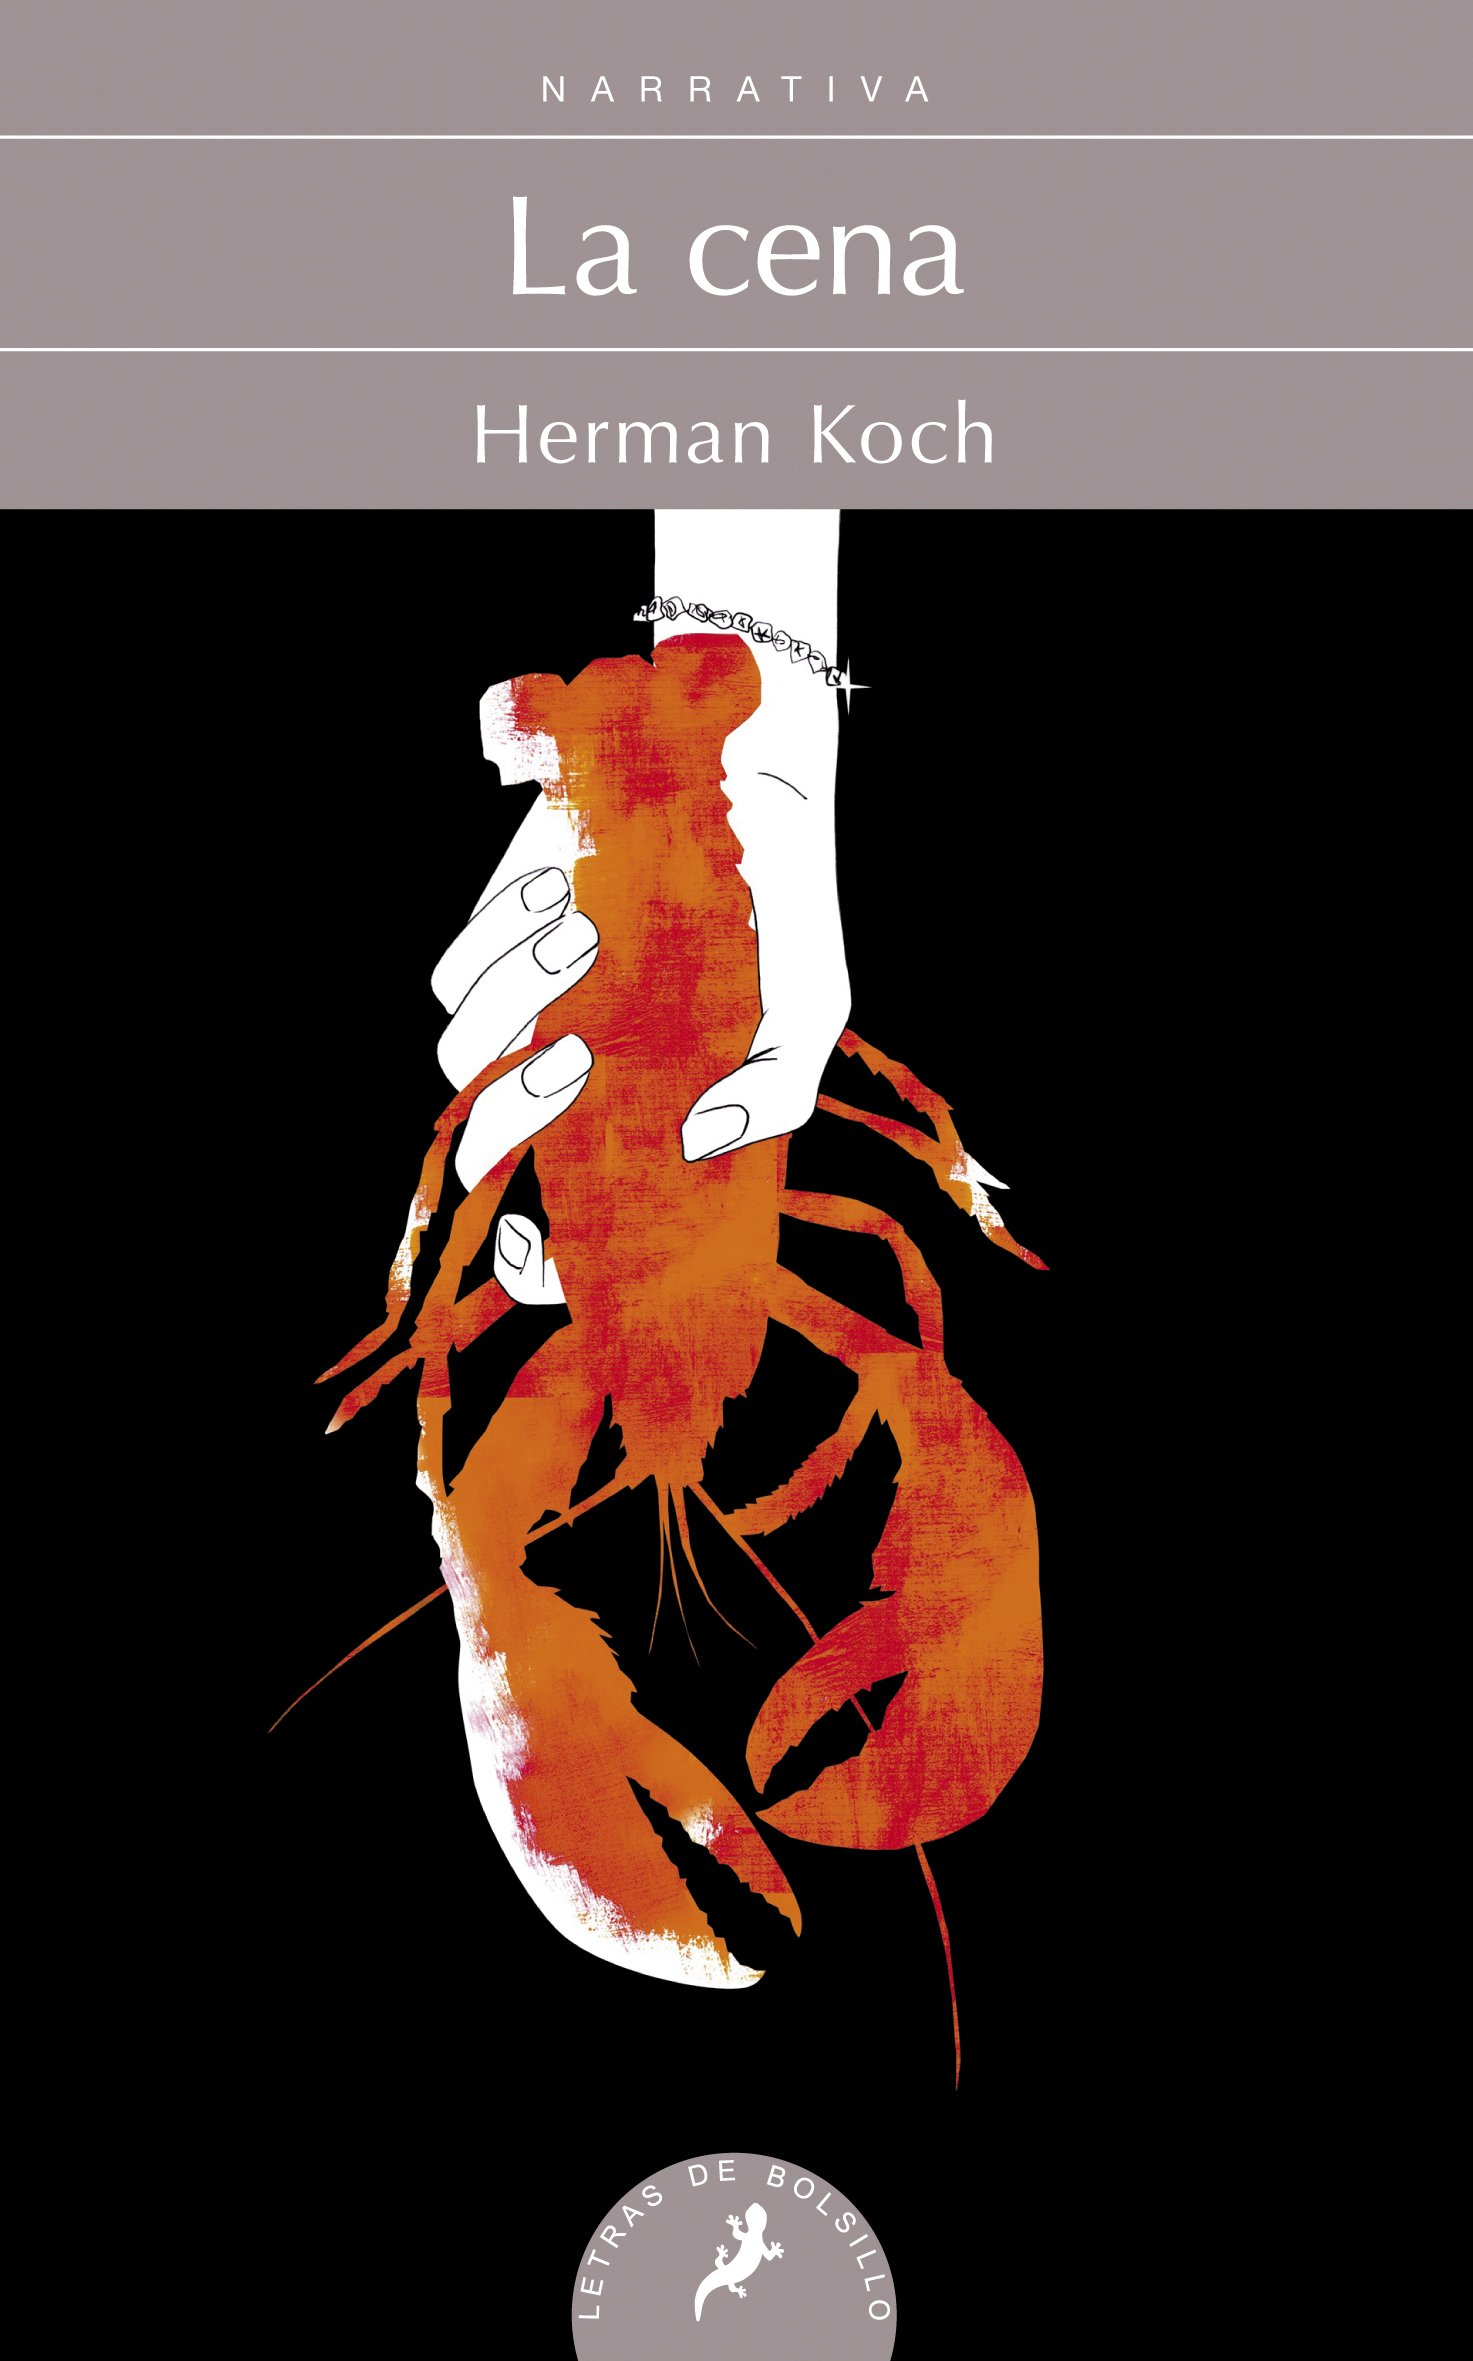 La cena (Narrativa) (Spanish Edition)